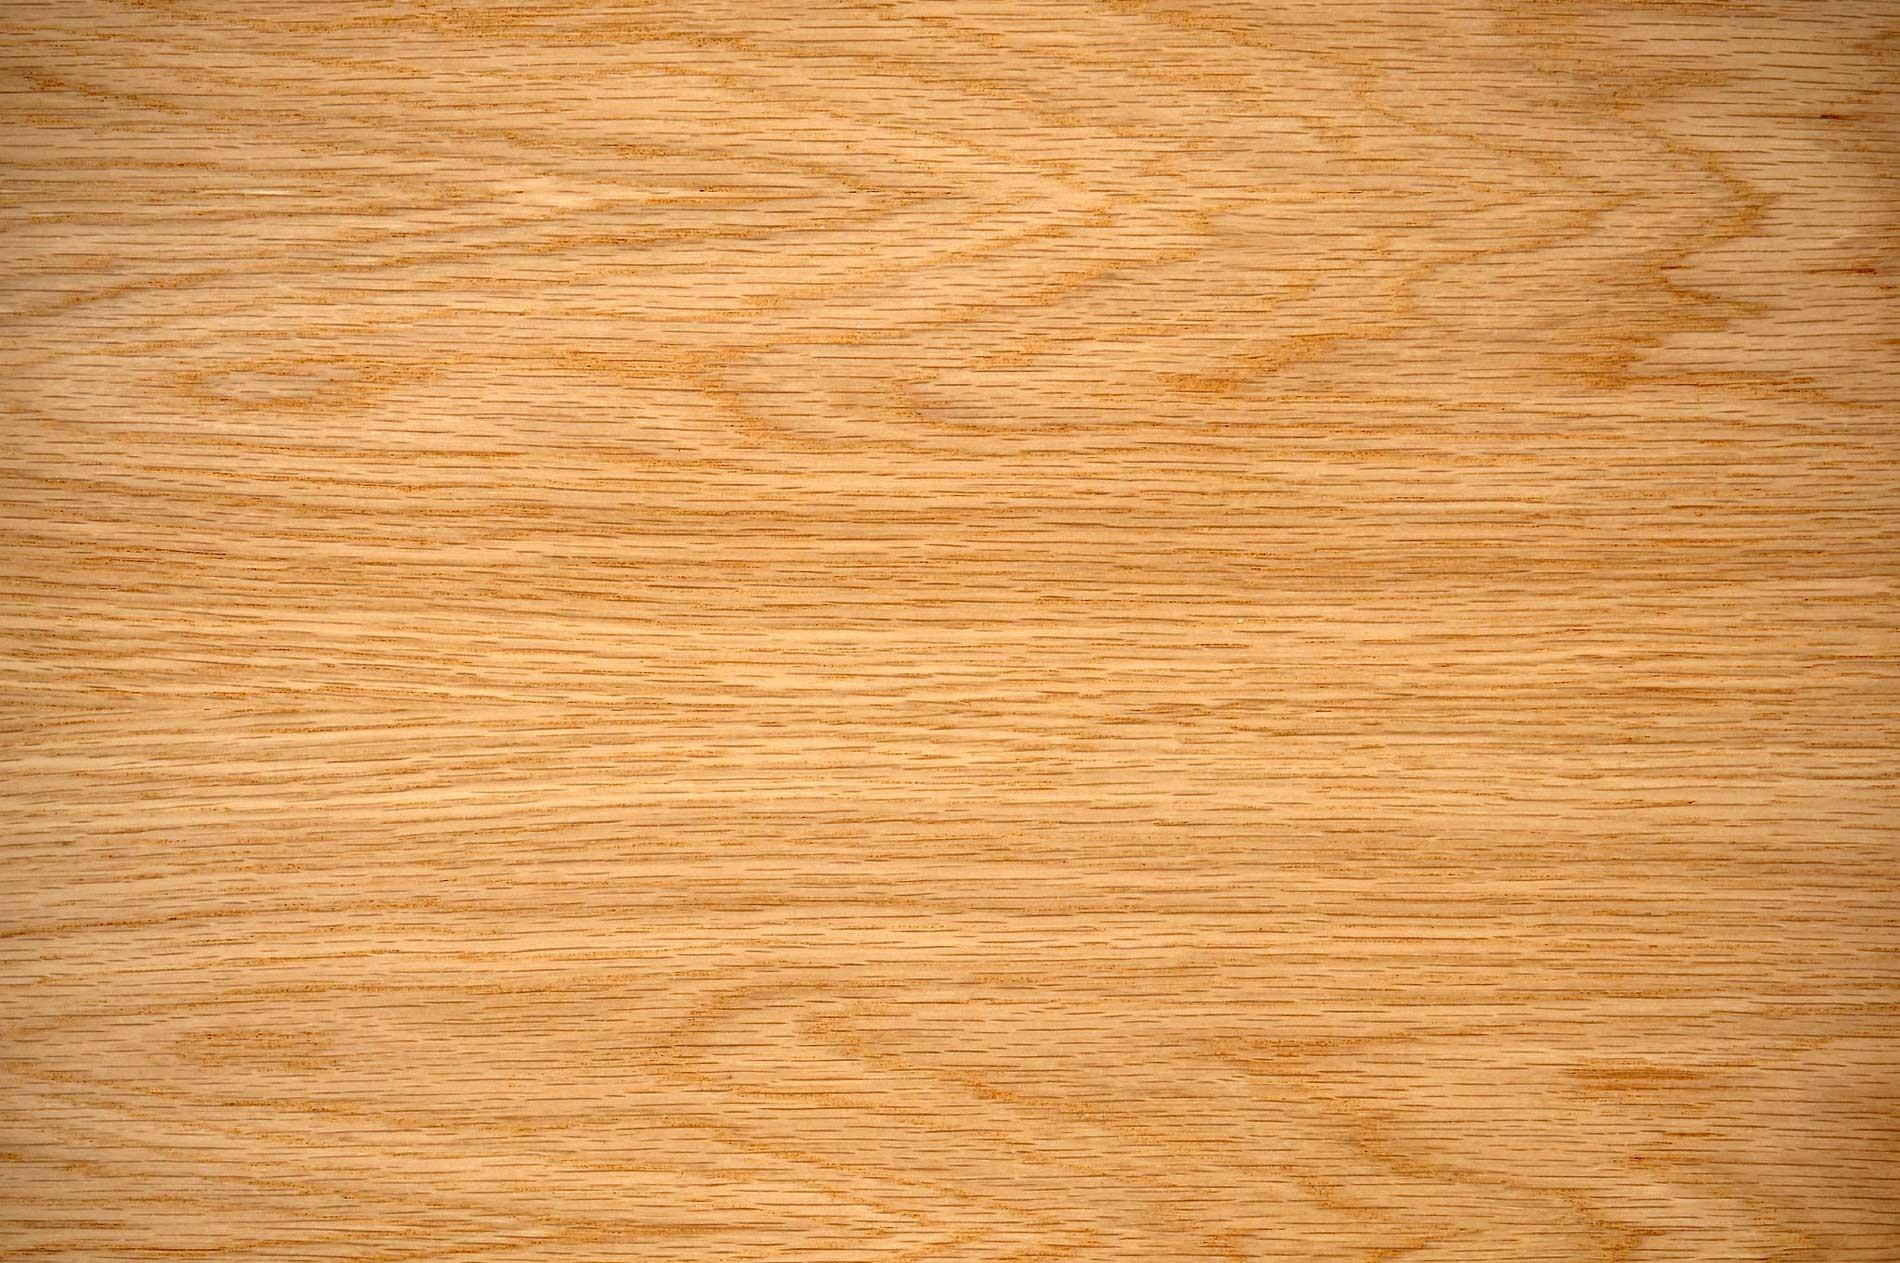 Viniles adhesivos imitaci n madera think publicidad for Planchas de madera para paredes